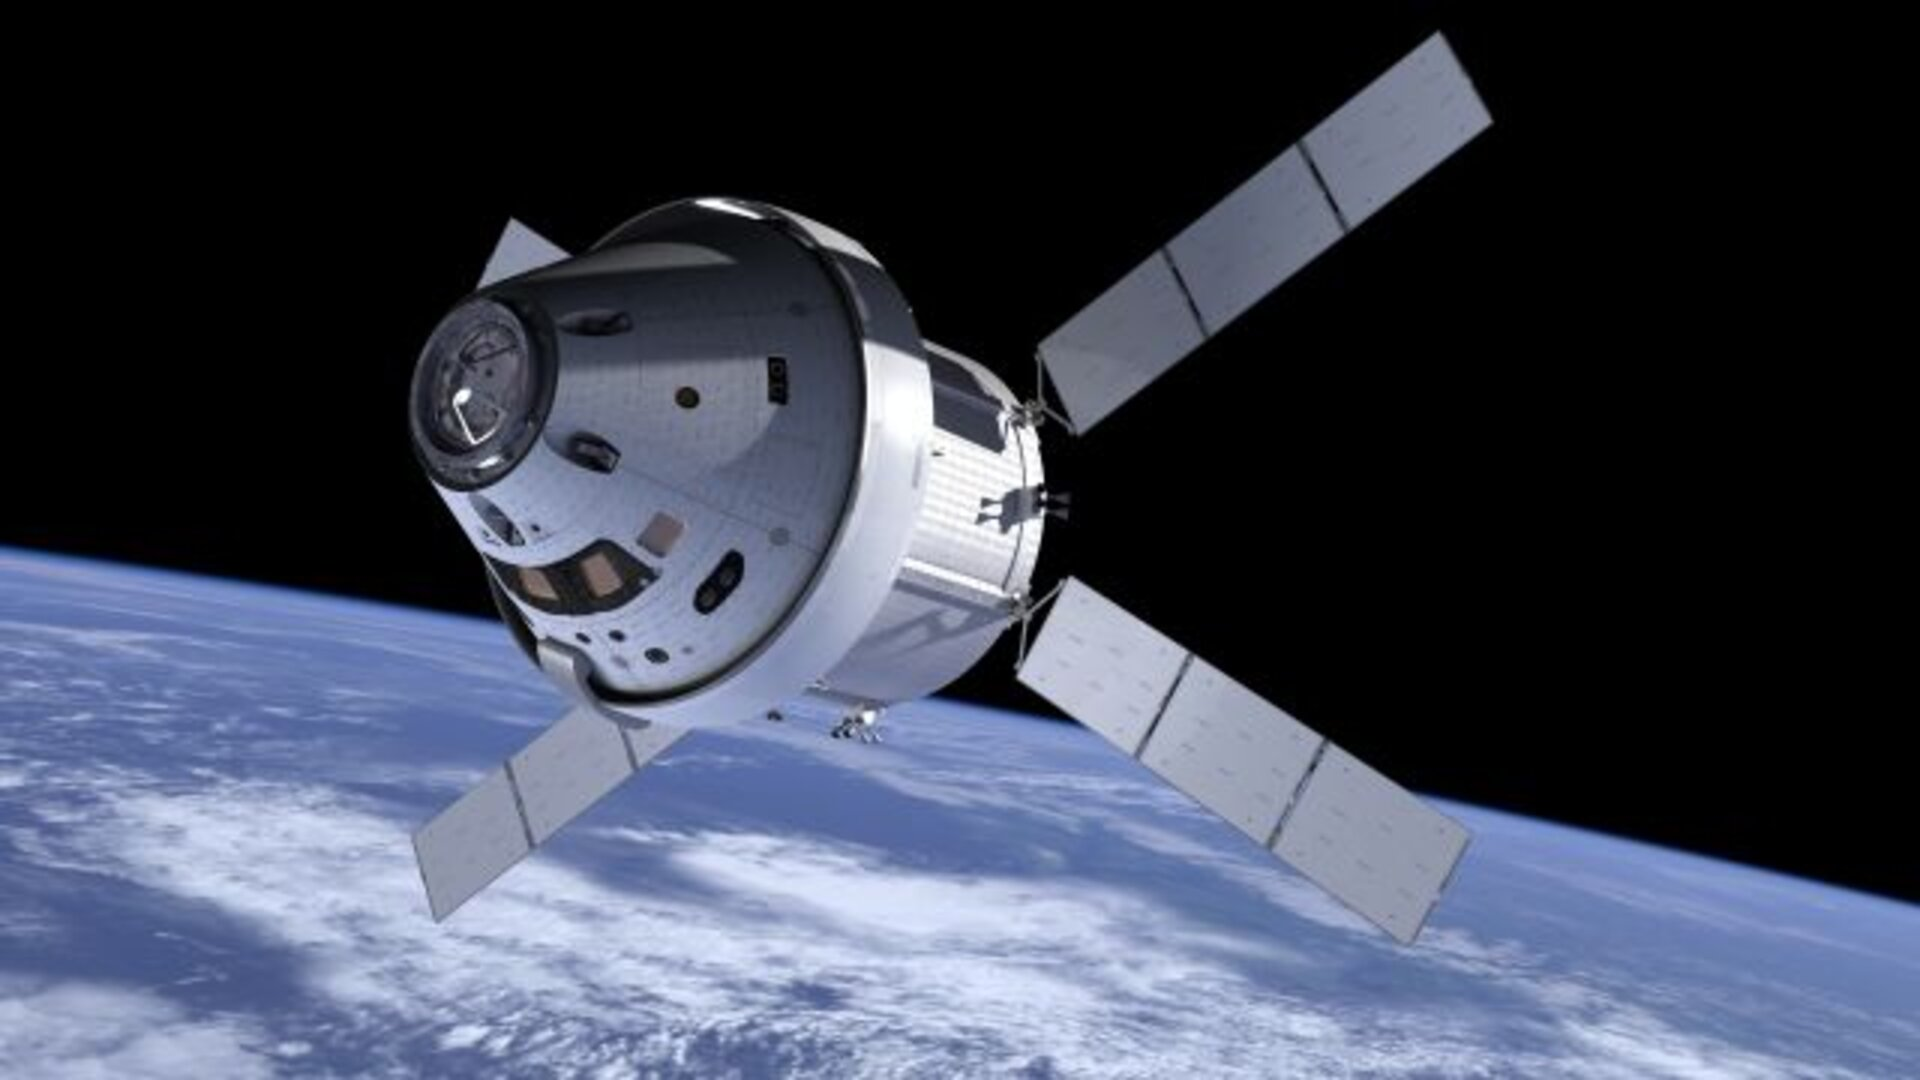 (T) Raumschiff . Foto & Bild | fotomontage, science